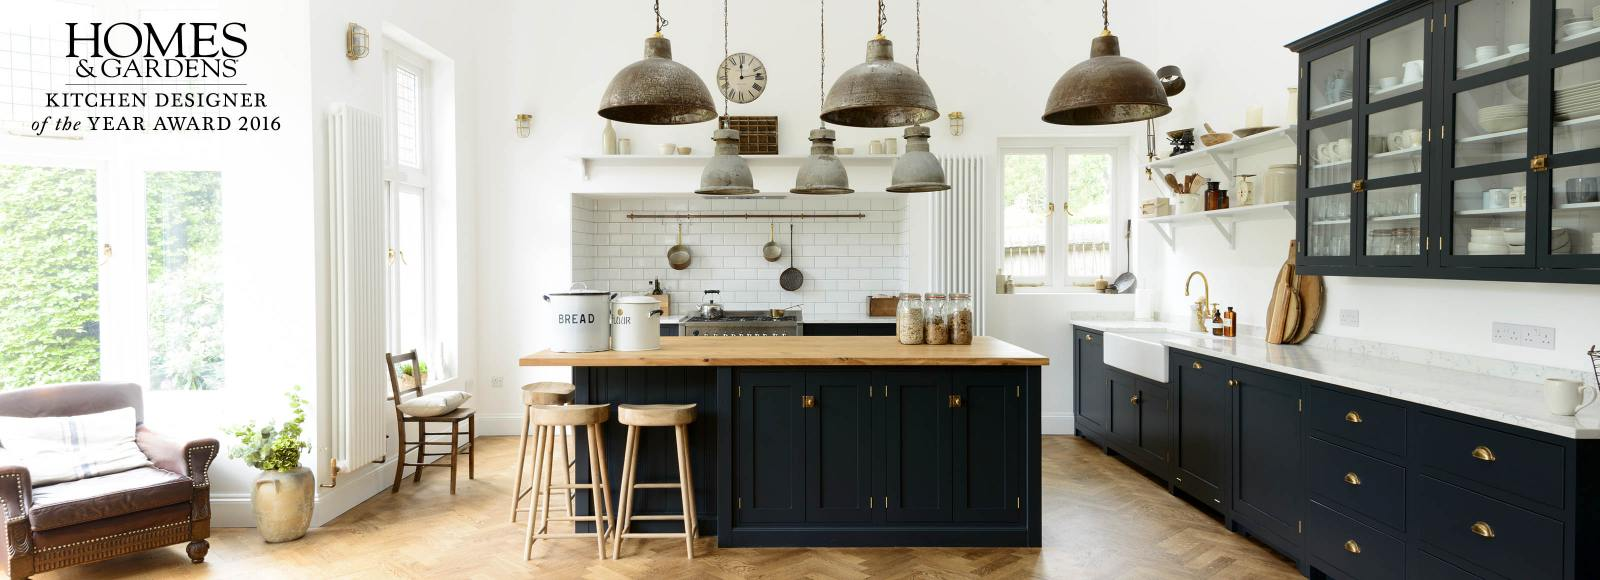 DeVOL Kitchens Simple Furniture Beautifully Made